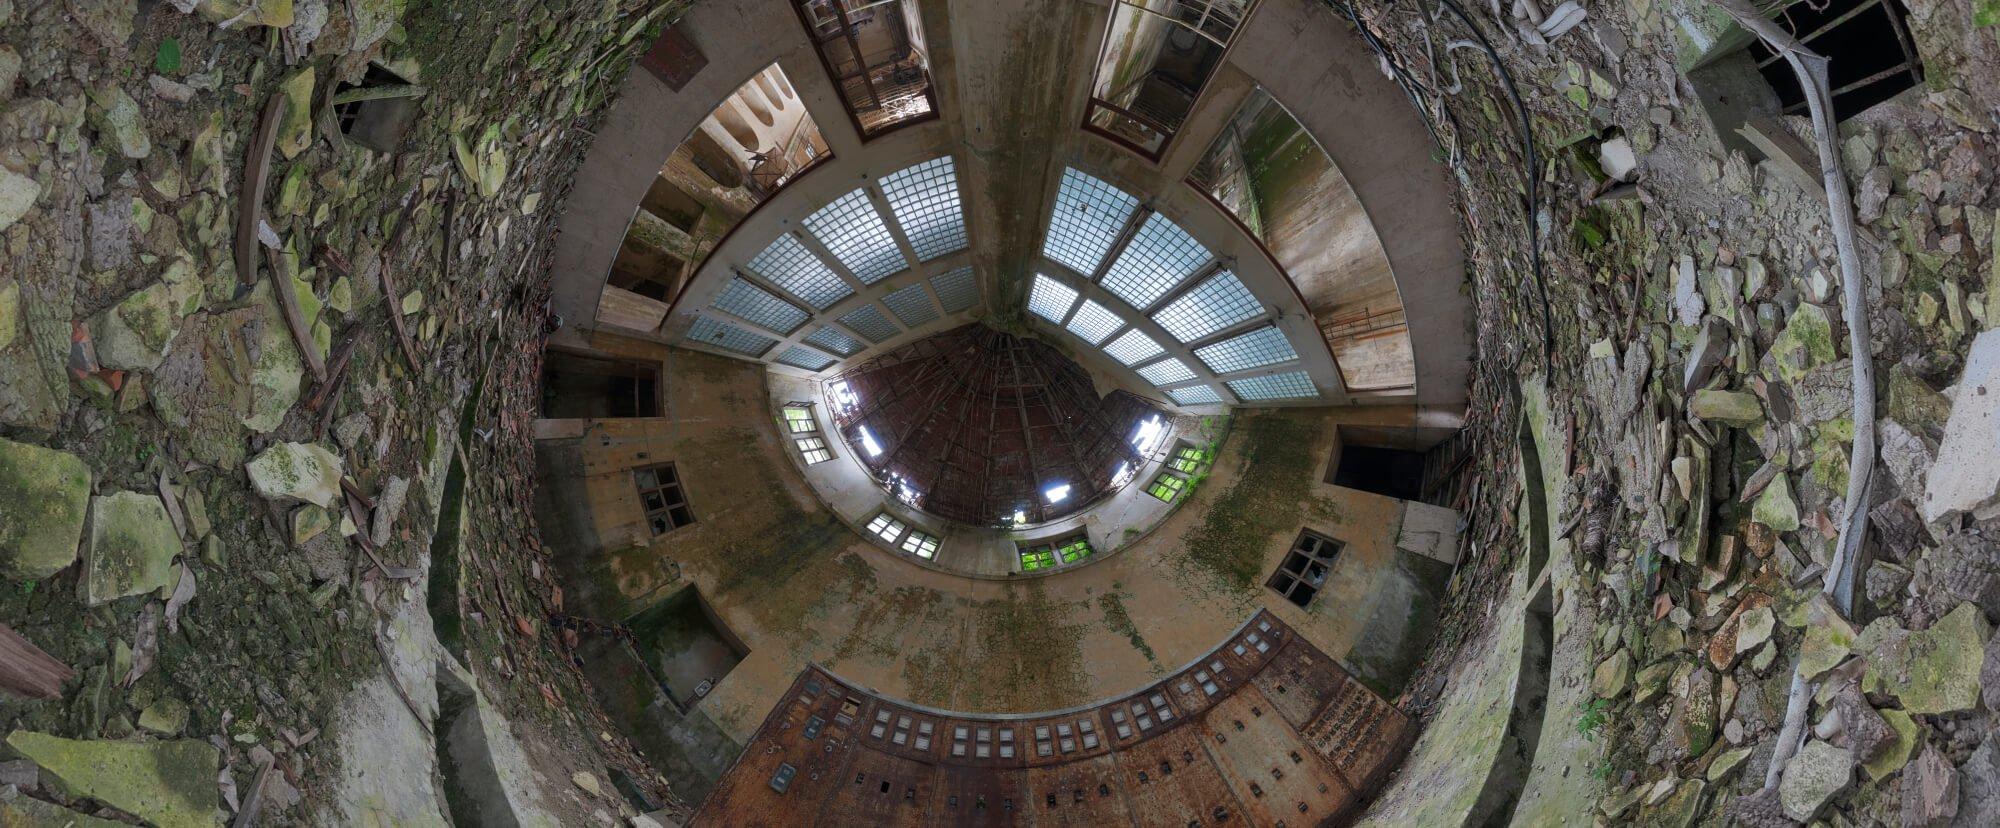 virtual tour urbex exploration italian factory